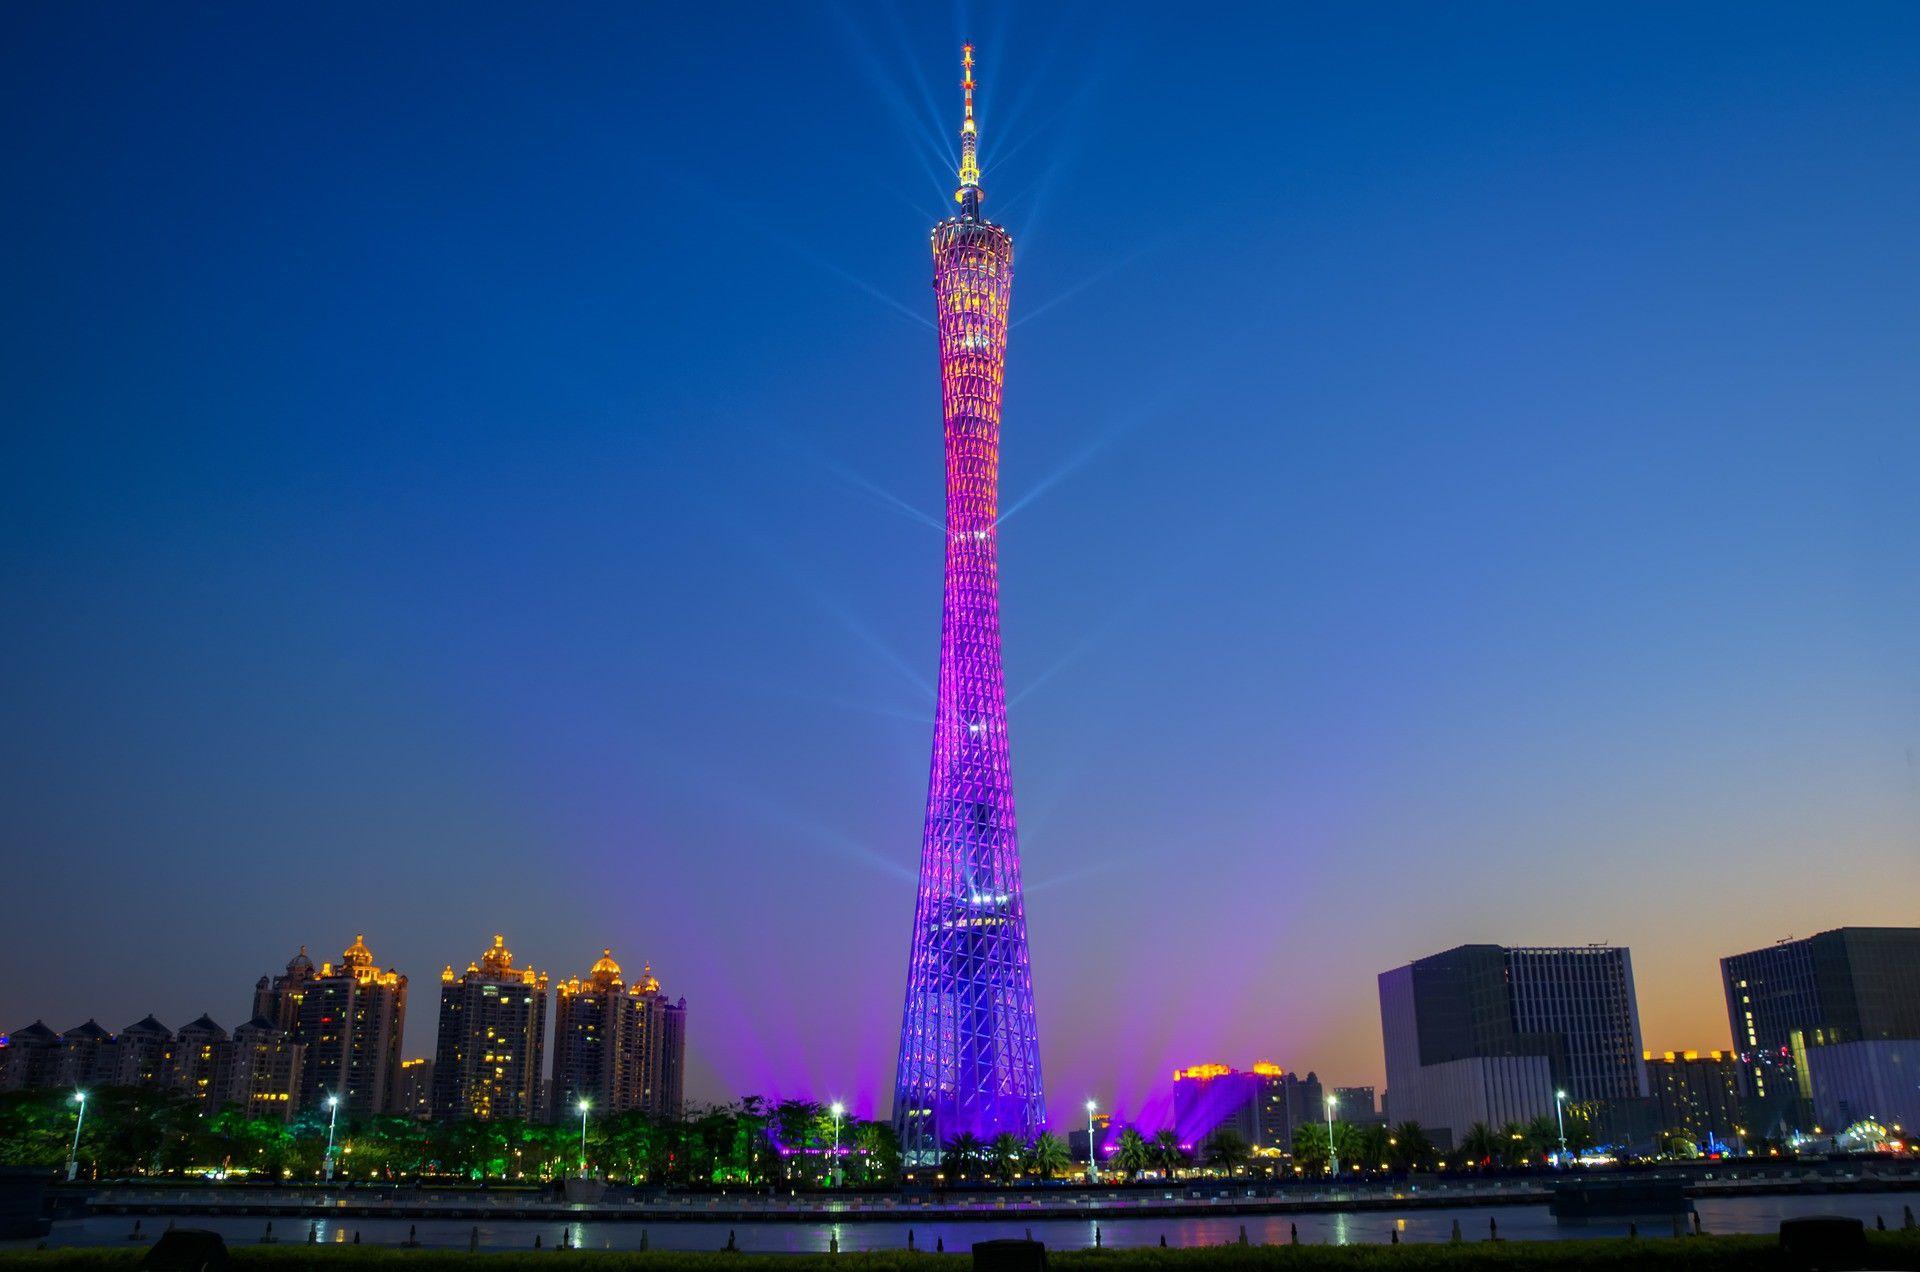 China (Guangdong) International Tourism Industry Expo: 11 – 13 Sept 2020 (Guangzhou)